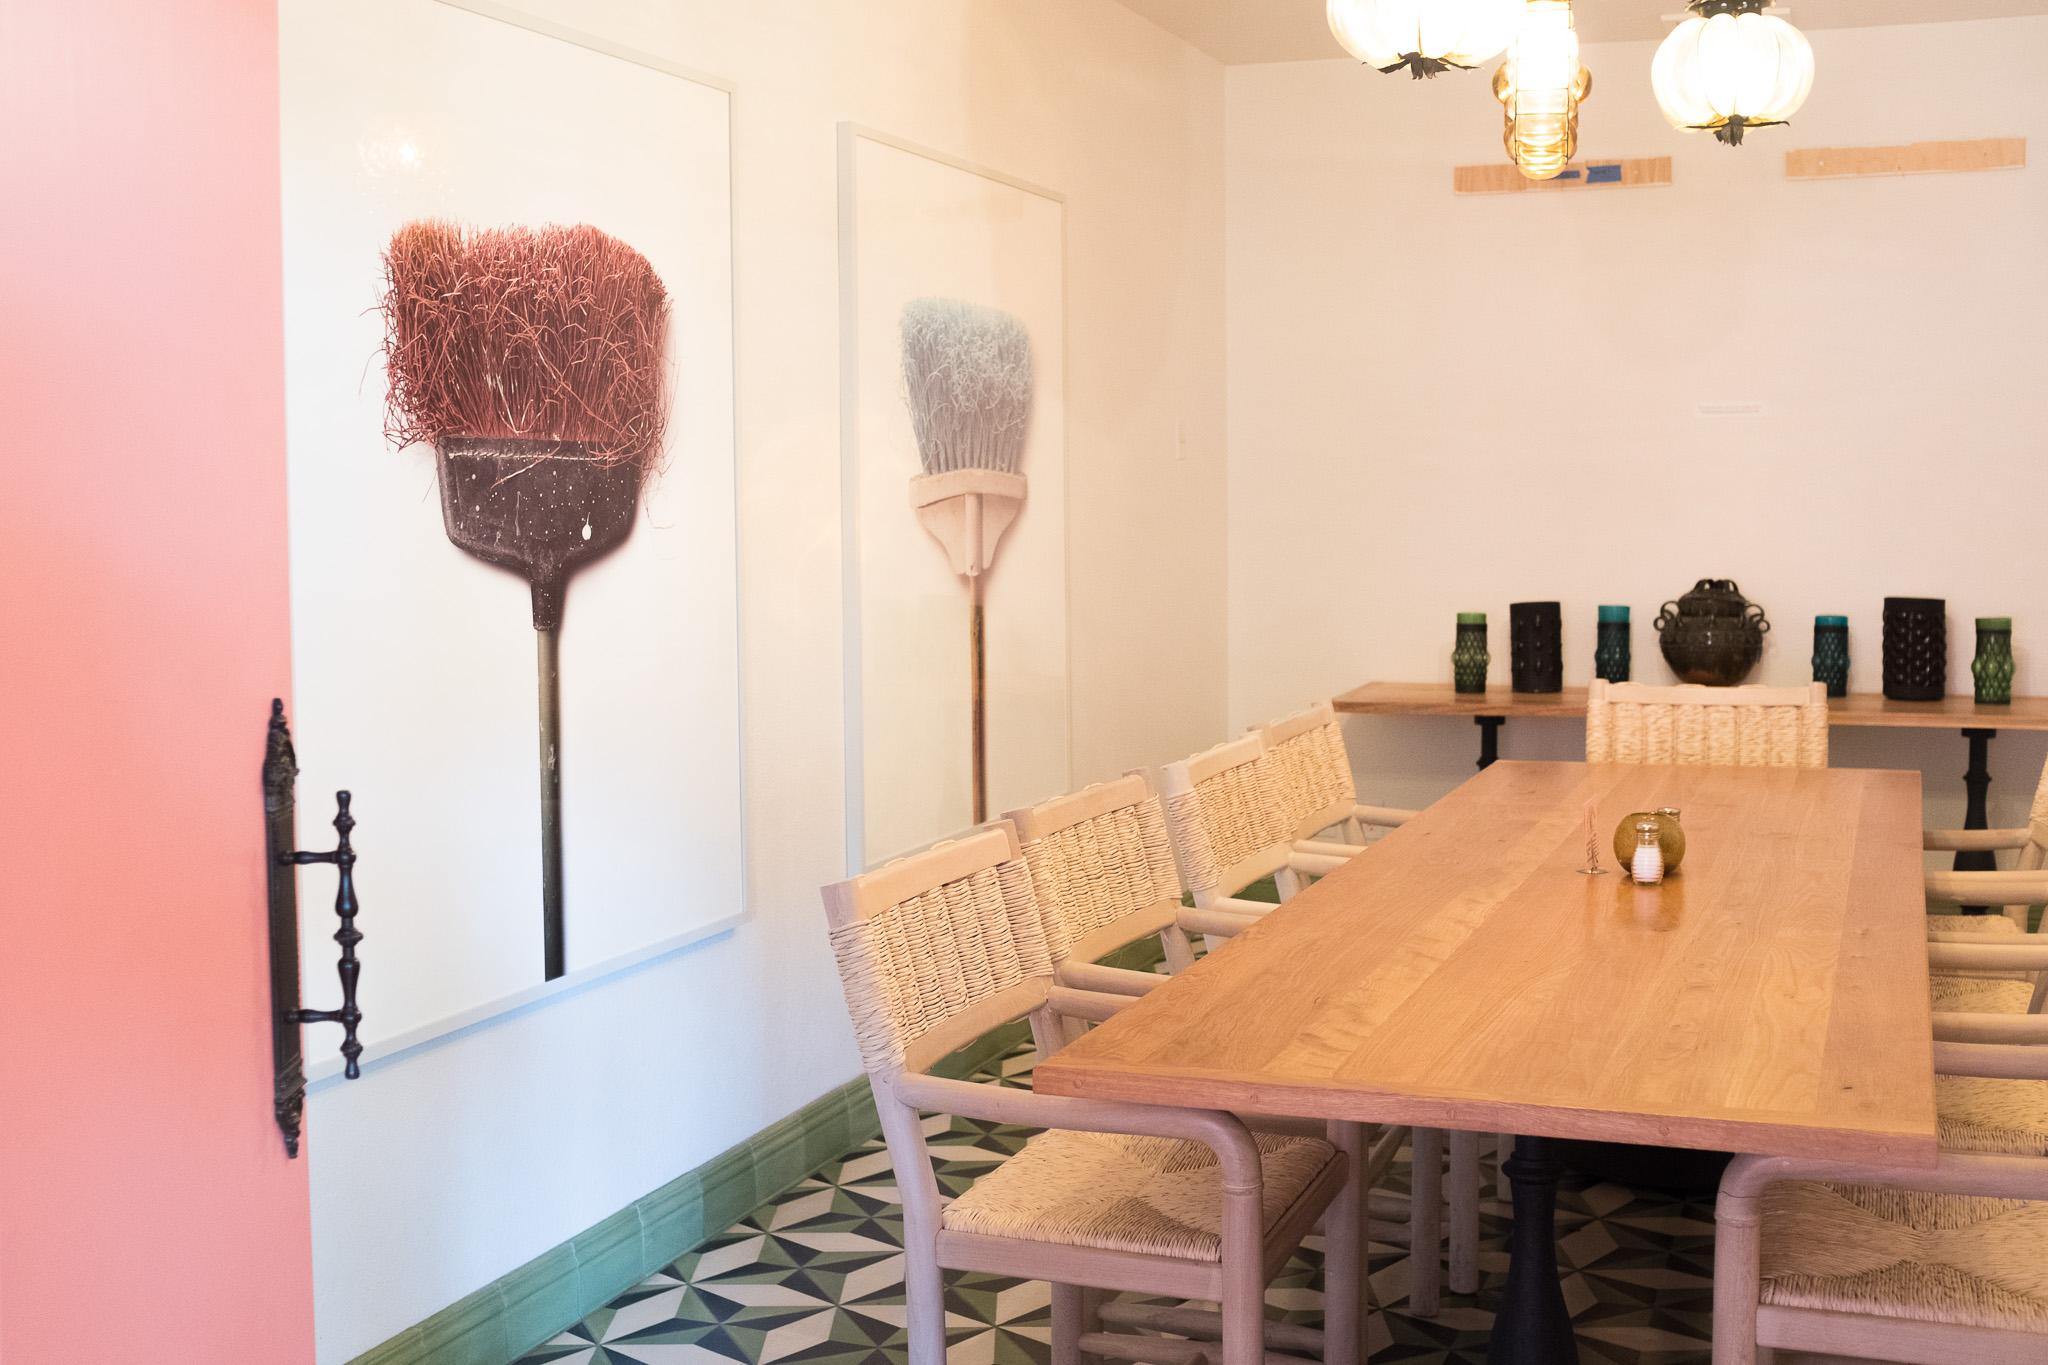 The 'Broom Room' at El Mirador Mexican Restaurant featuring work by Chuck Ramirez.